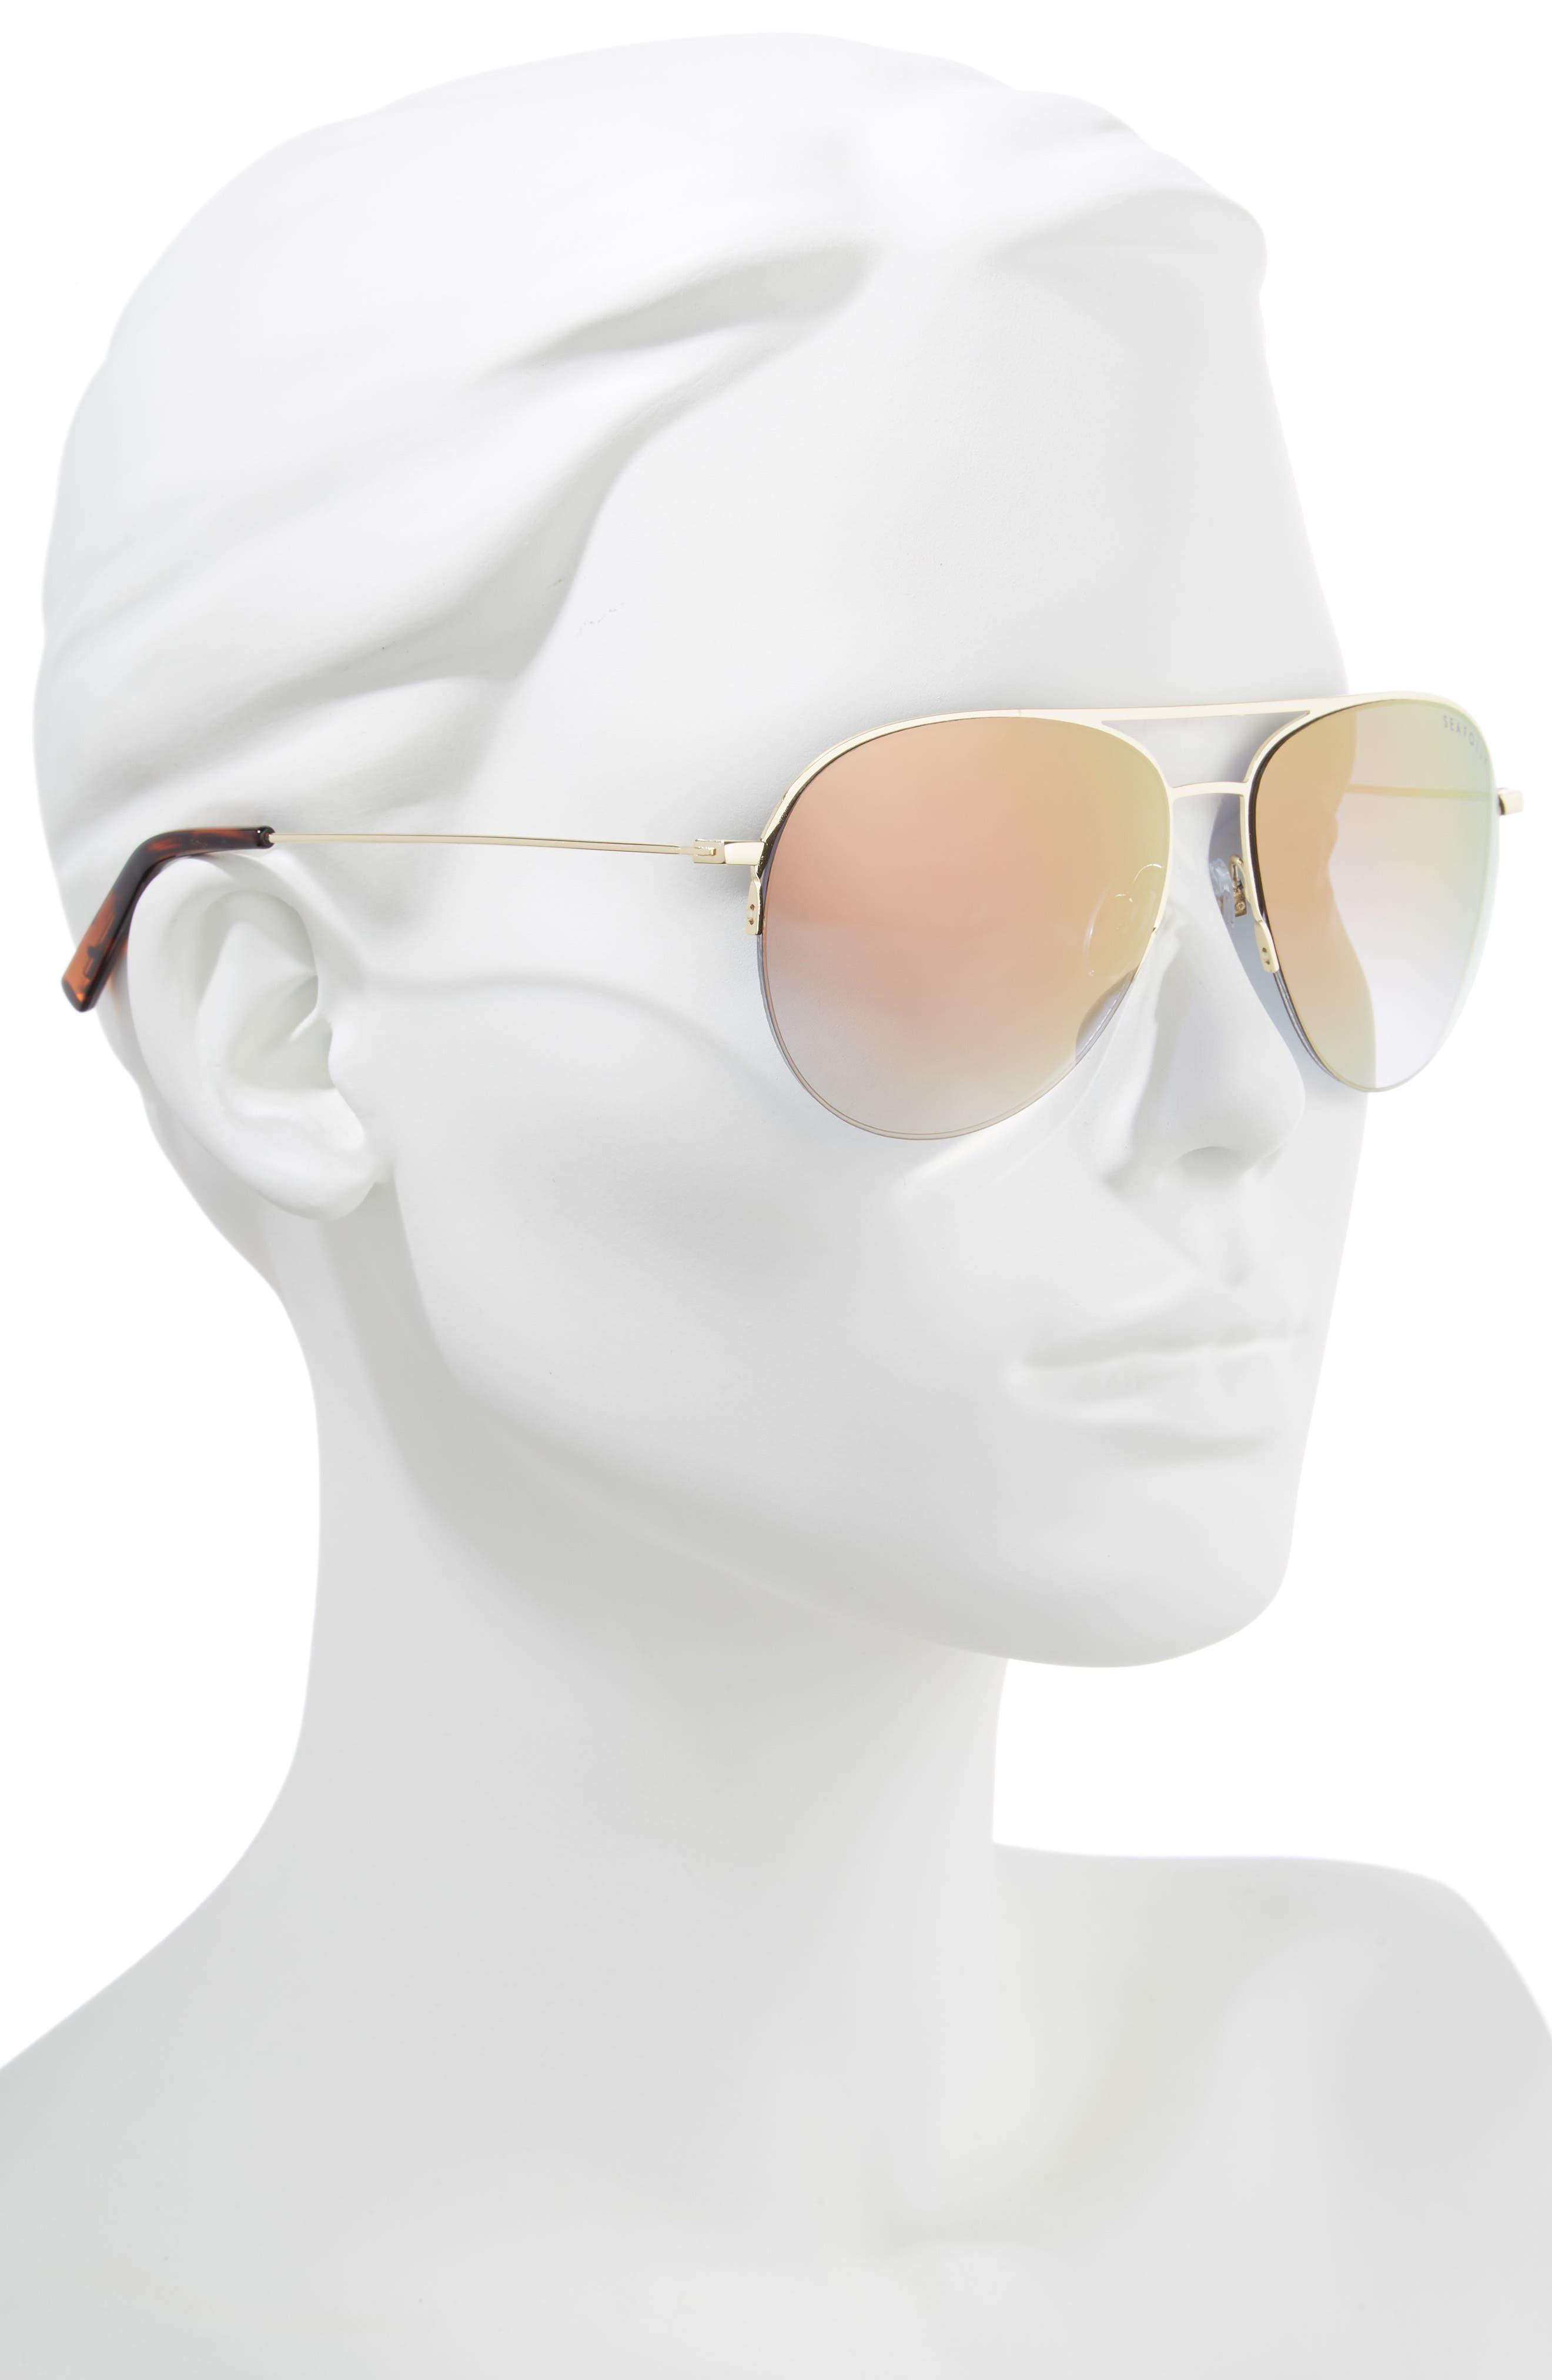 Tamarama 60mm Aviator Sunglasses,                             Alternate thumbnail 2, color,                             Gold